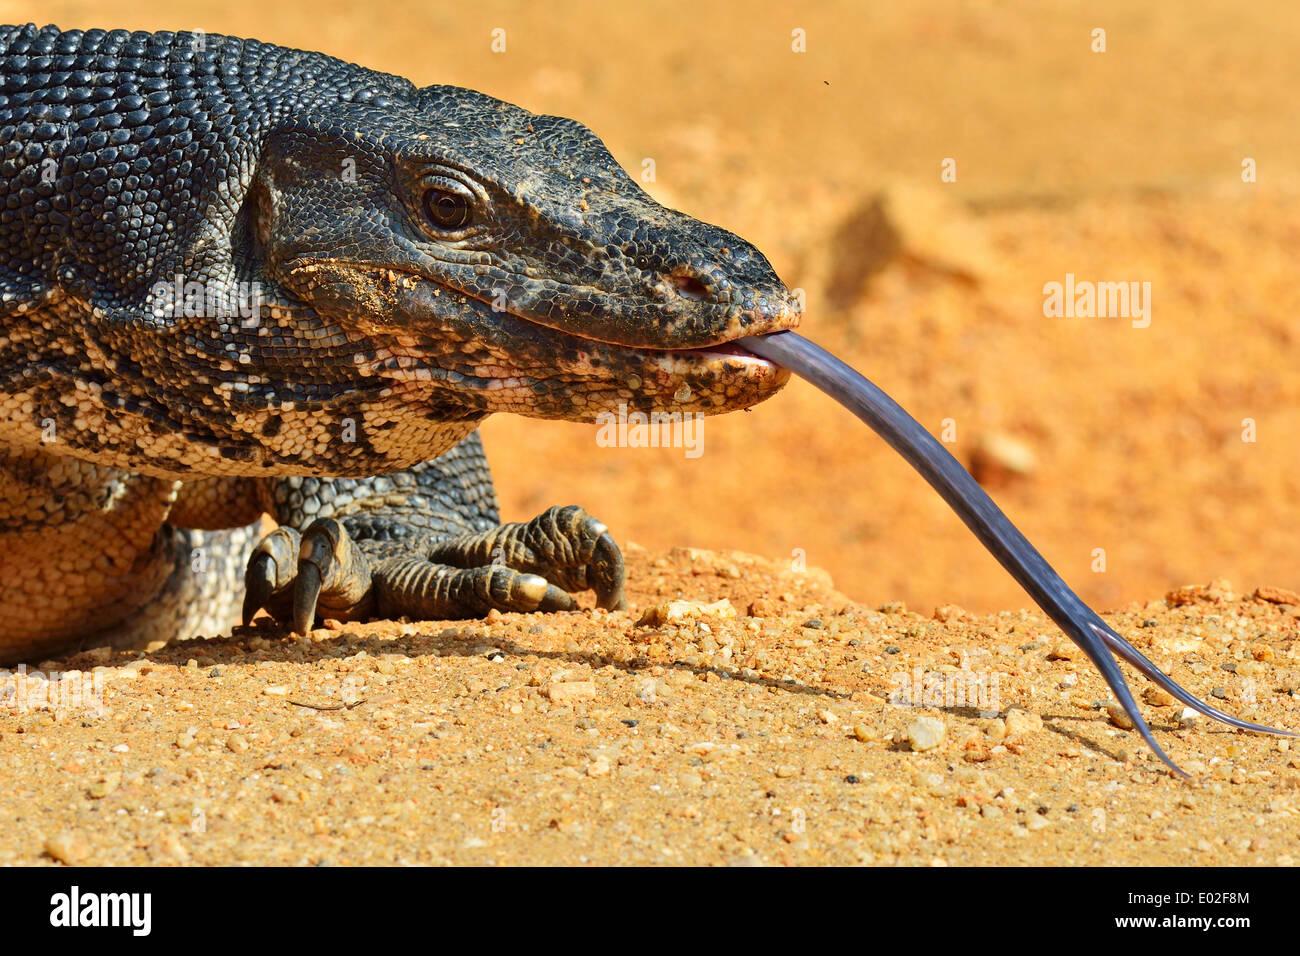 Moniteur de l'eau (Varanus salvator salvator), Polonnaruwa, Sri Lanka, Photo Stock